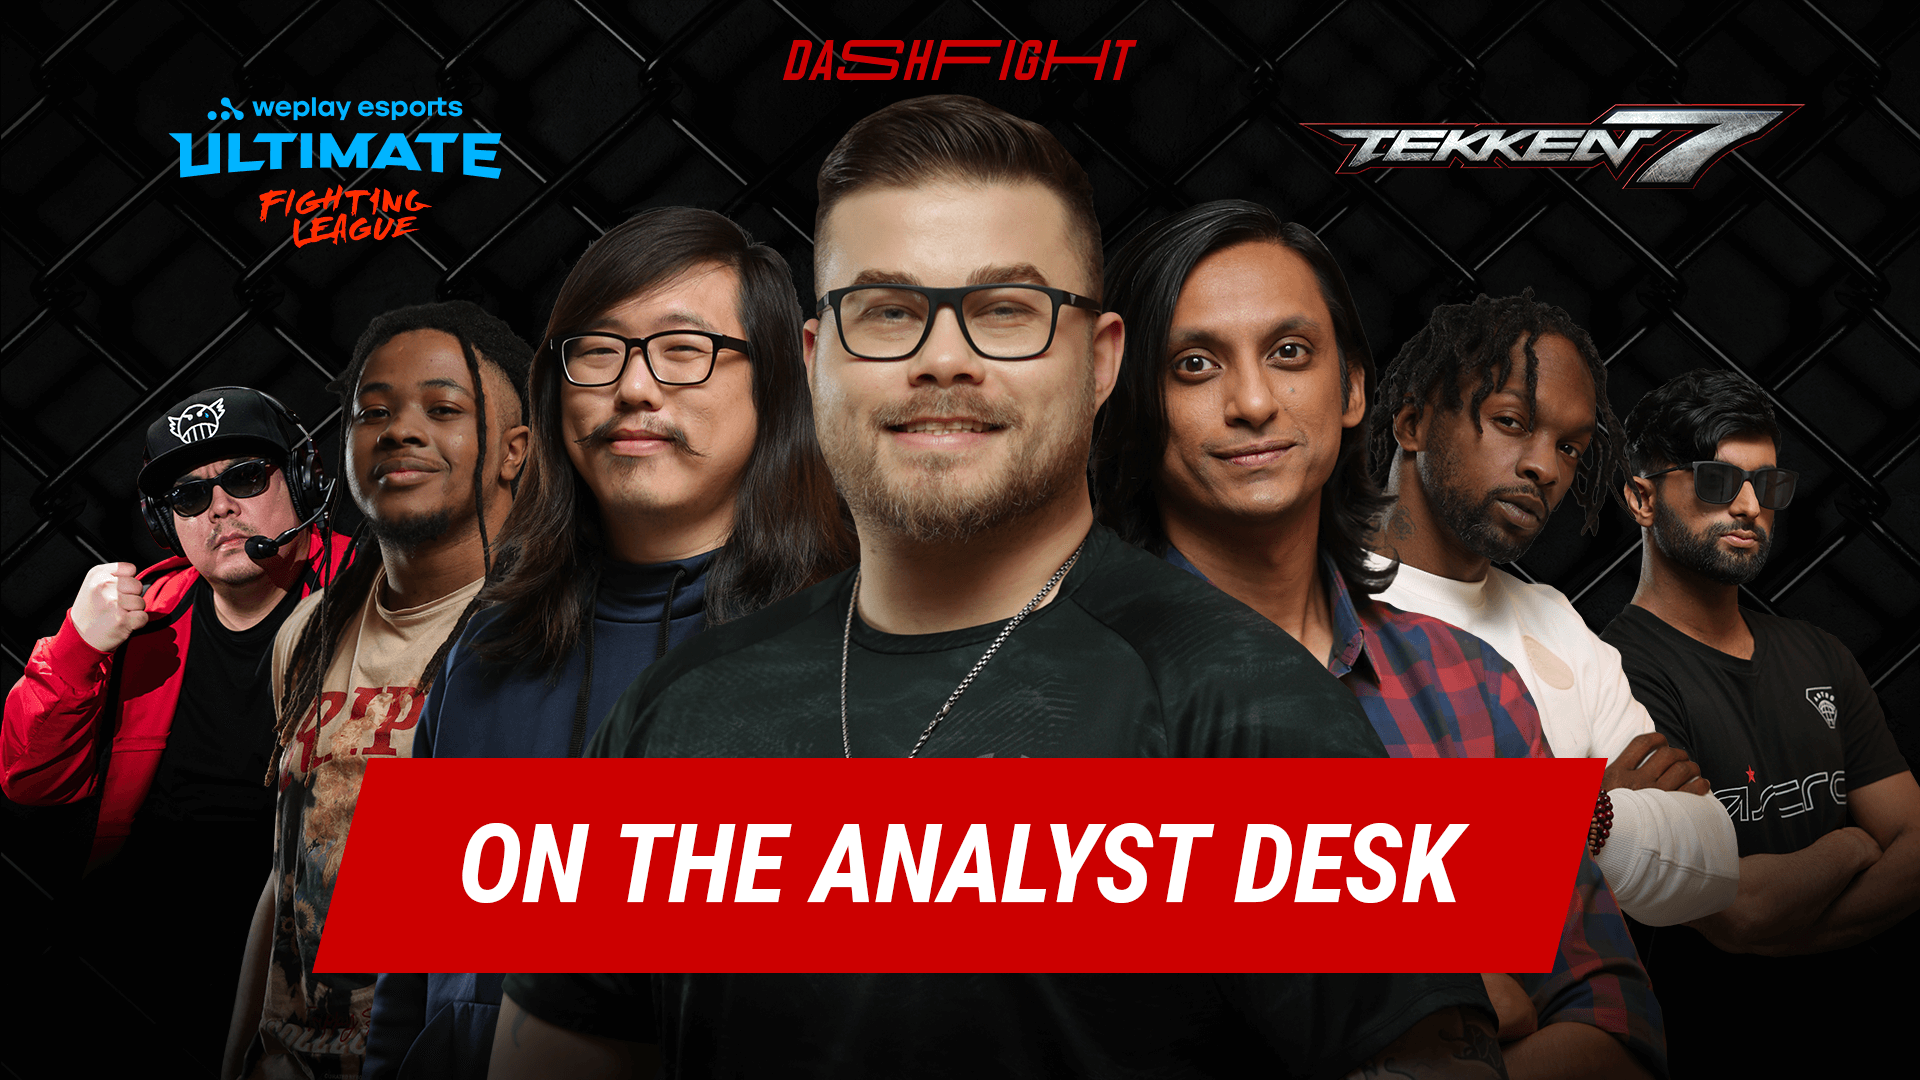 WUFL Season 1 Tekken 7 - On the Analyst Desk: Post-Tournament Thoughts